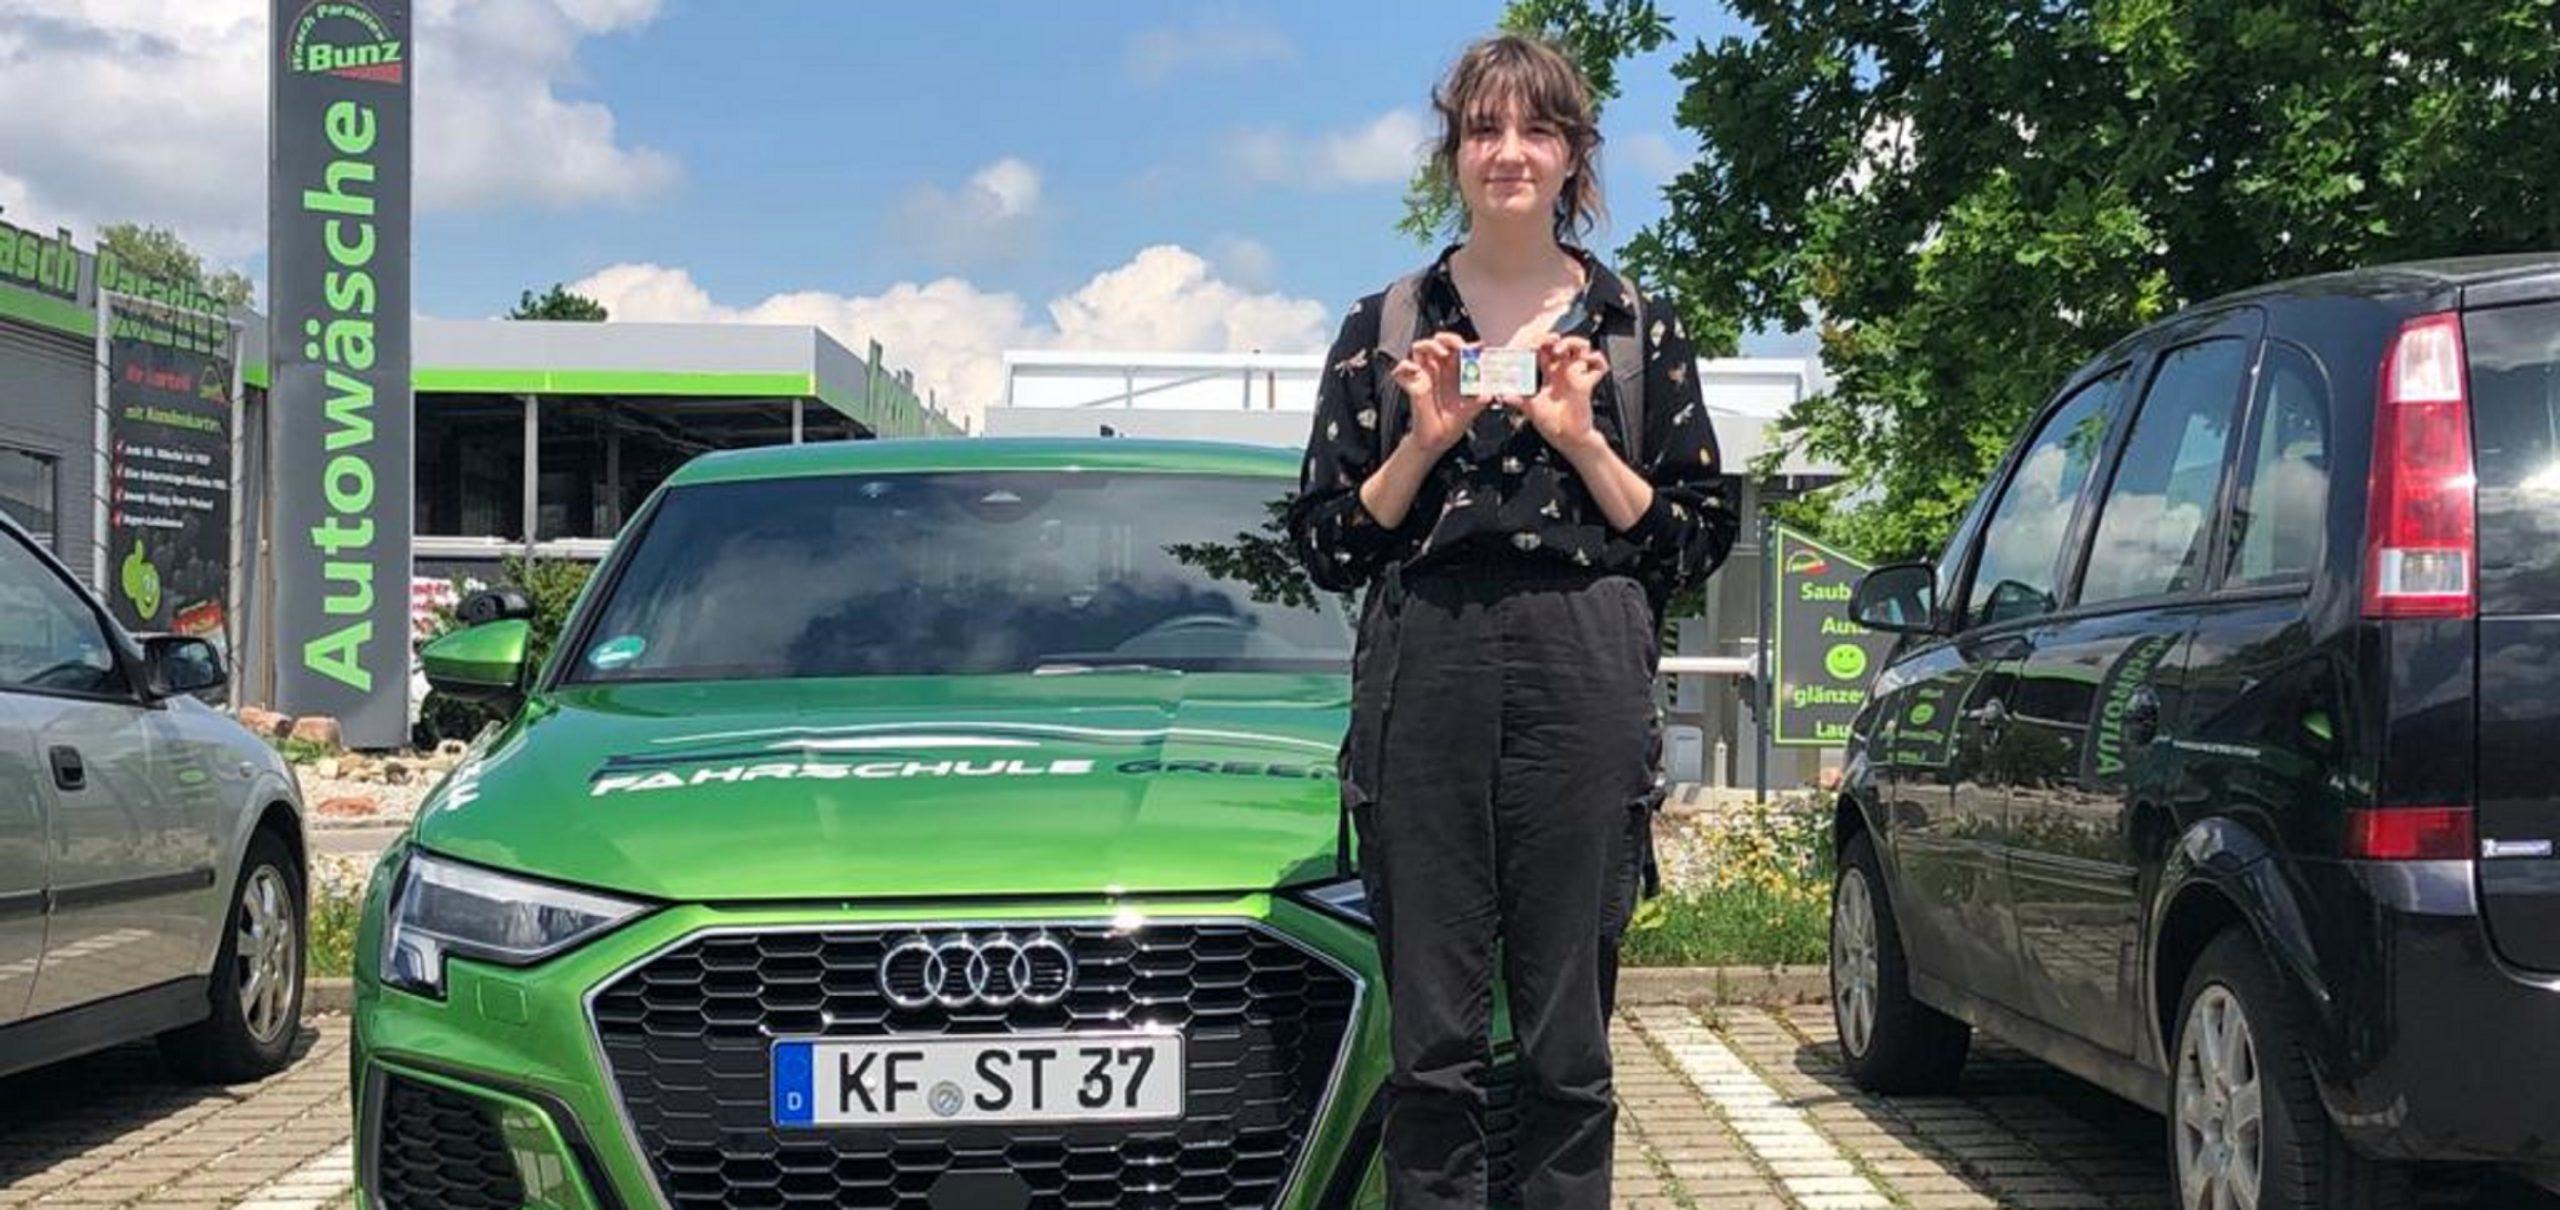 jana-wilhelm-pruefungen-2021-fahrschule-green-kaufbeuren-neugablonz